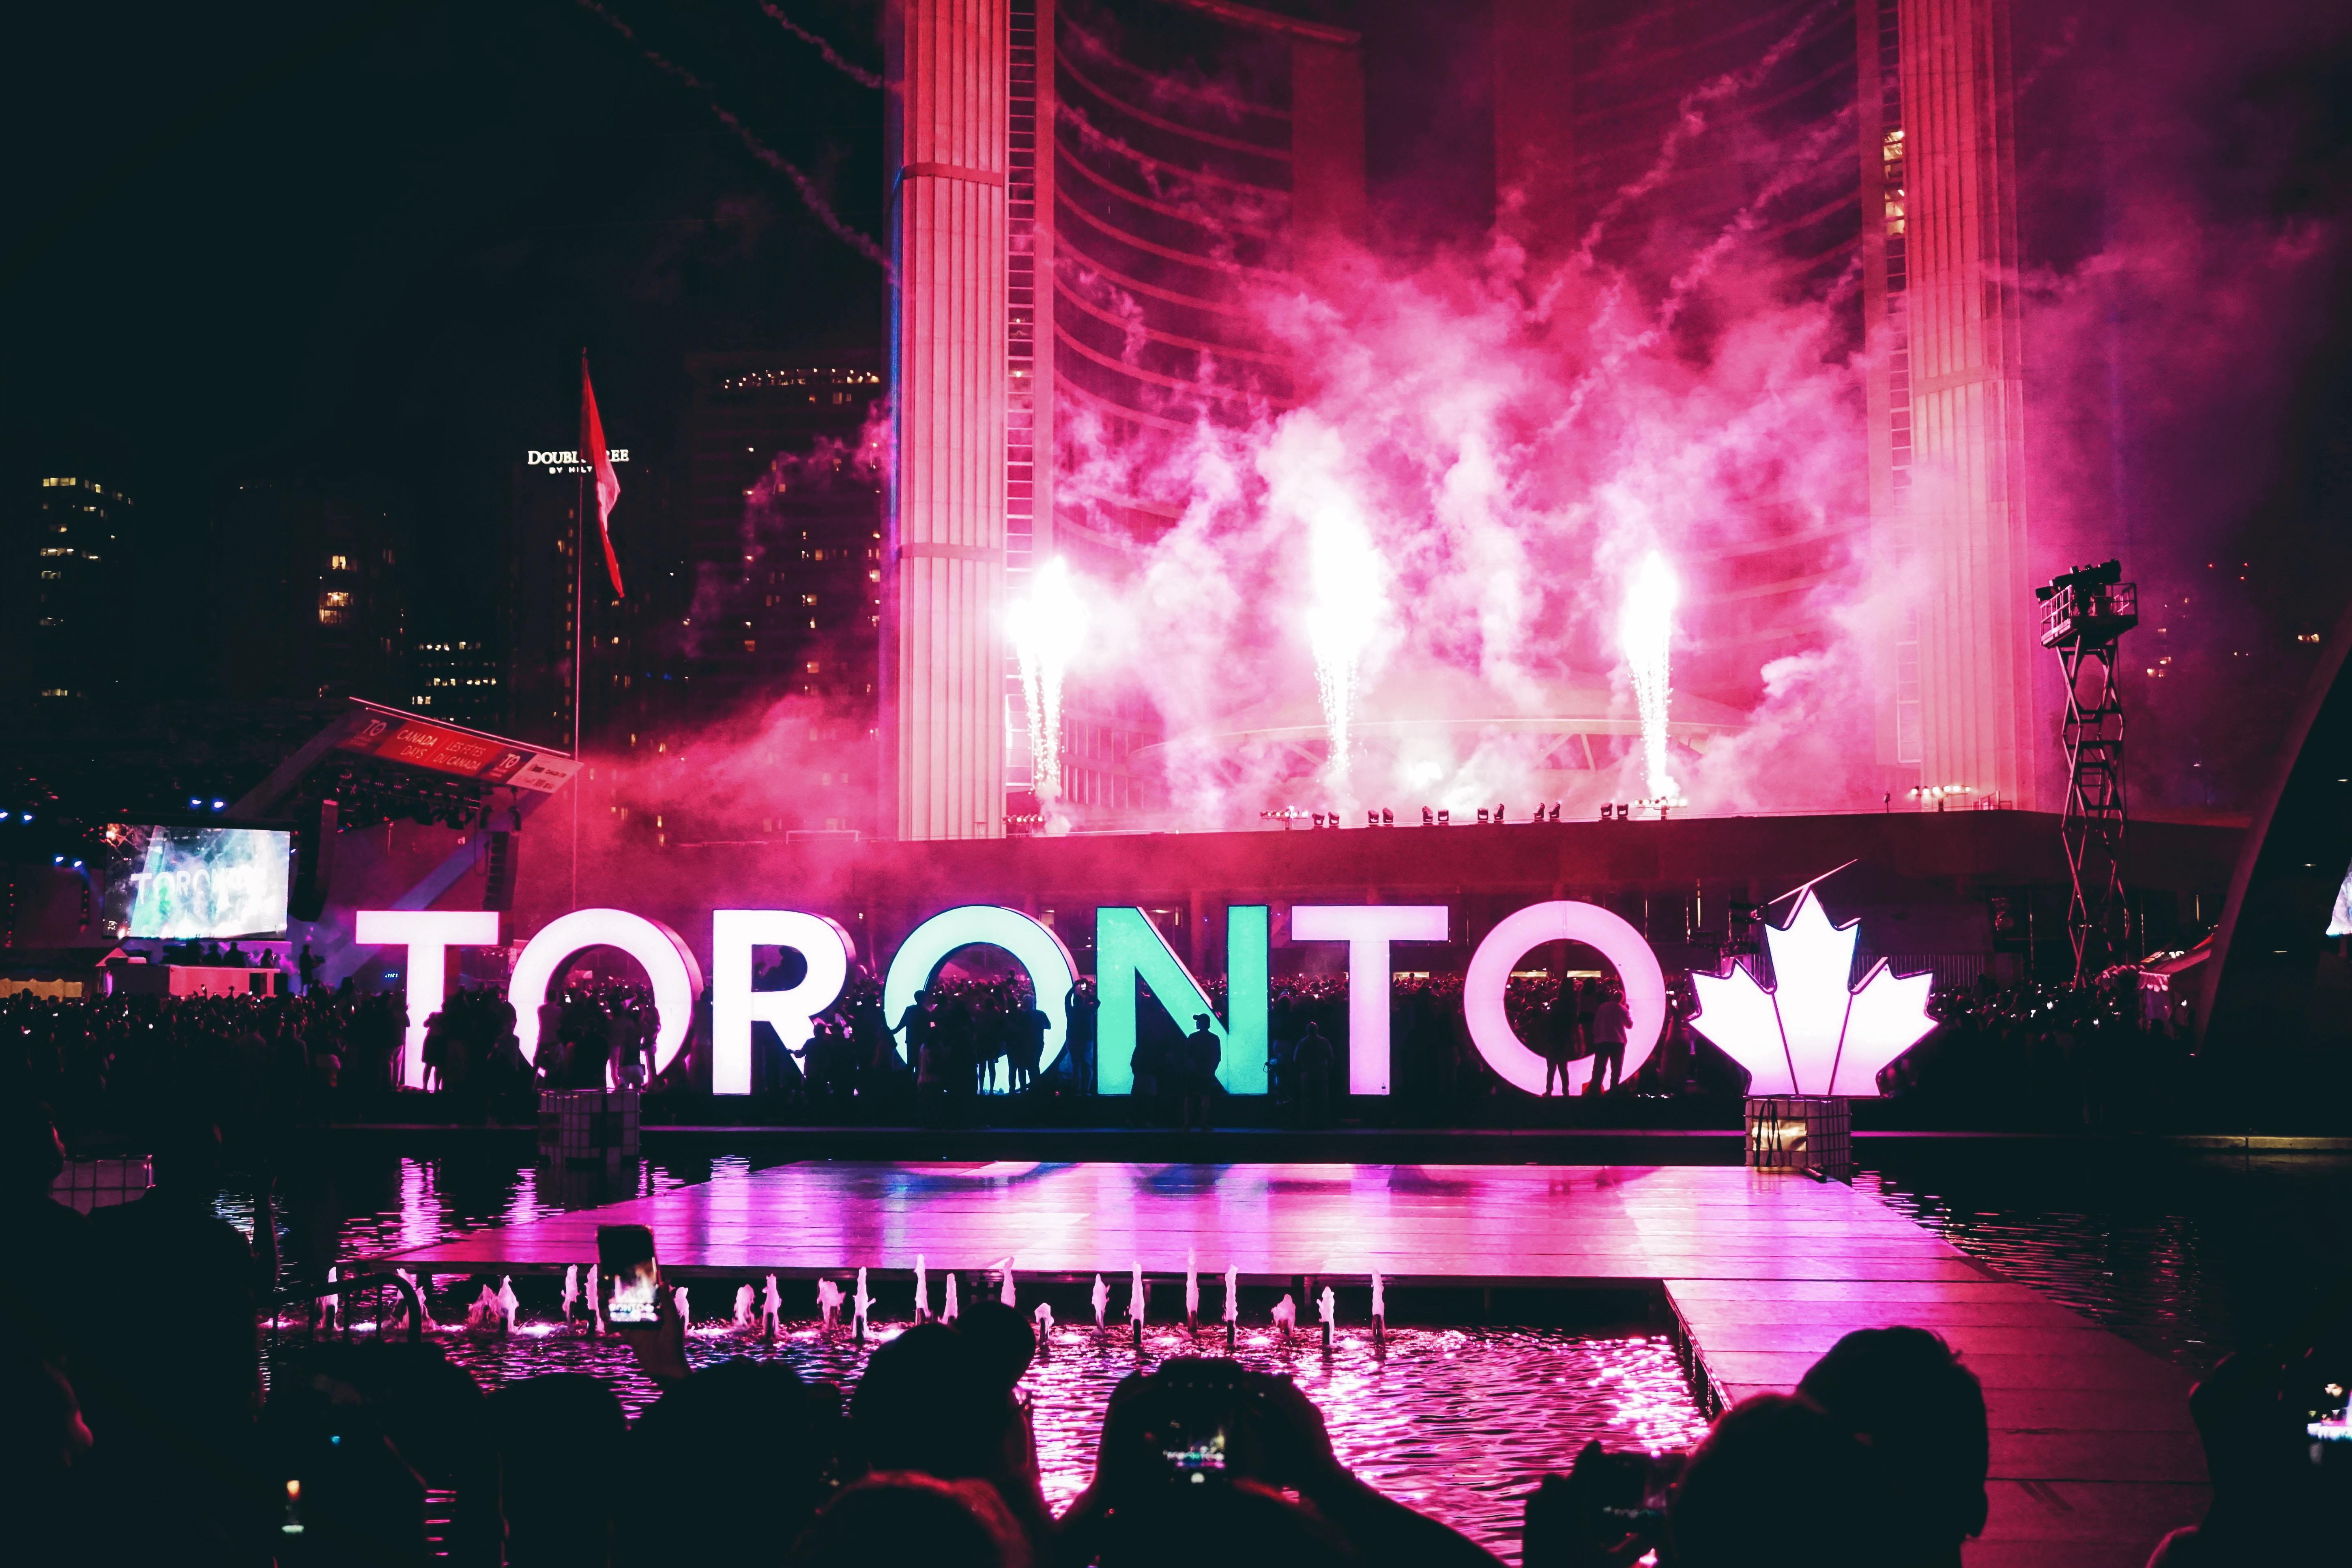 Toronto Statue